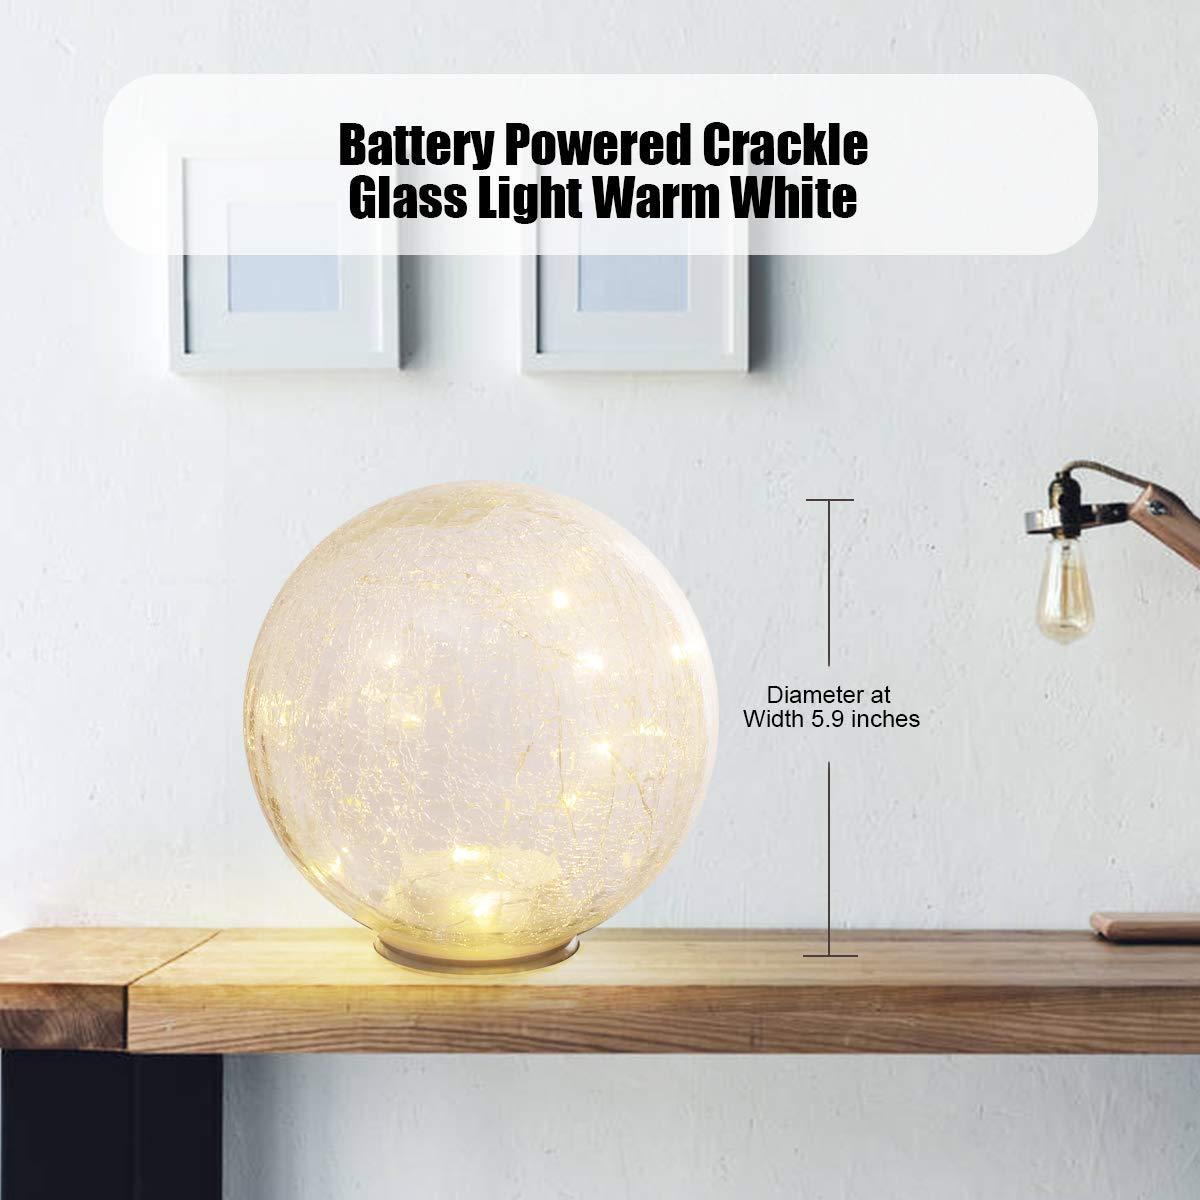 Glass Ball LED Light Wireless Crackle Glass Light Warm White Night Lamp for Bedroom Living-room Dresser Nursery Kitchen Garden Restaurant Modern Glass Decoration Glass Craft